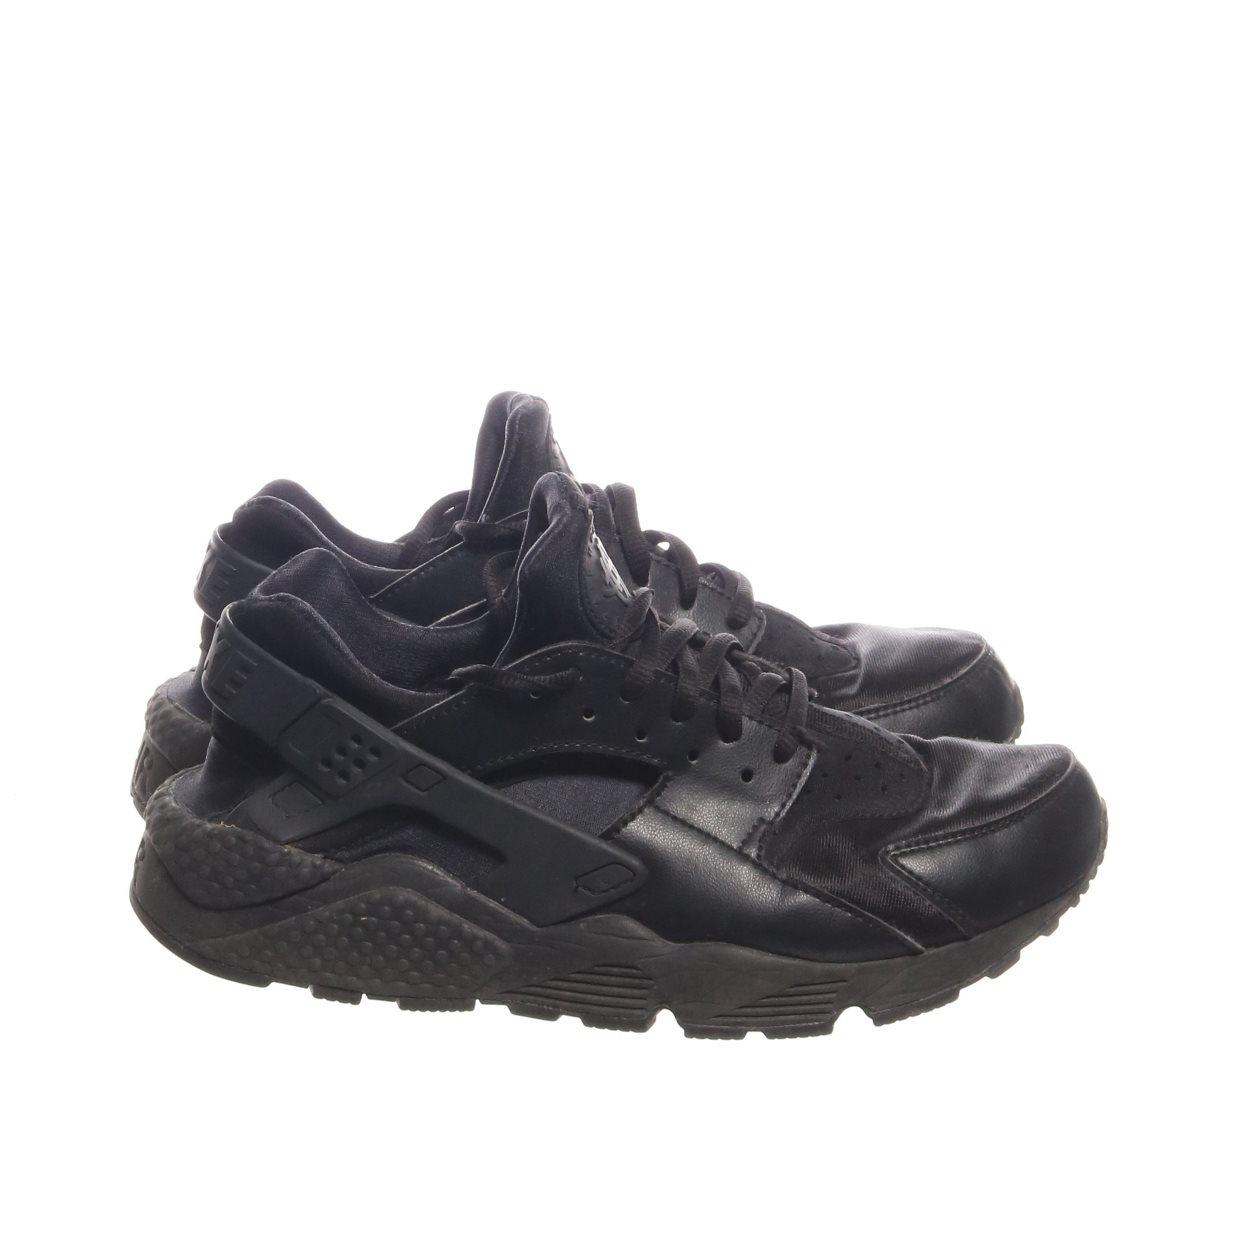 335b606f91a Nike, Sneakers, Strl: 40,5, Air Huarache,.. (339691134) ᐈ Sellpy på ...